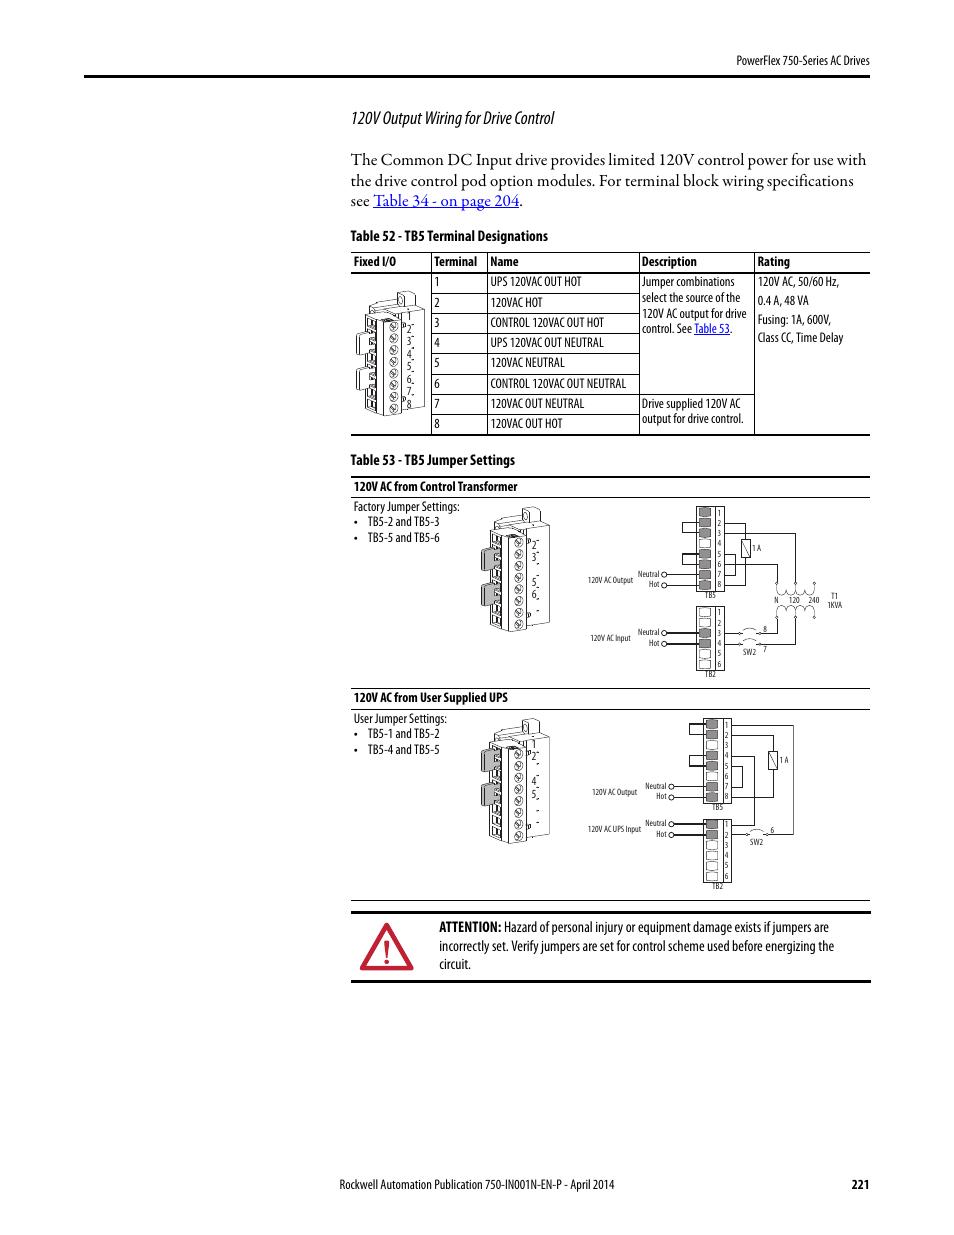 WRG-2228] Ac Drive Wiring on